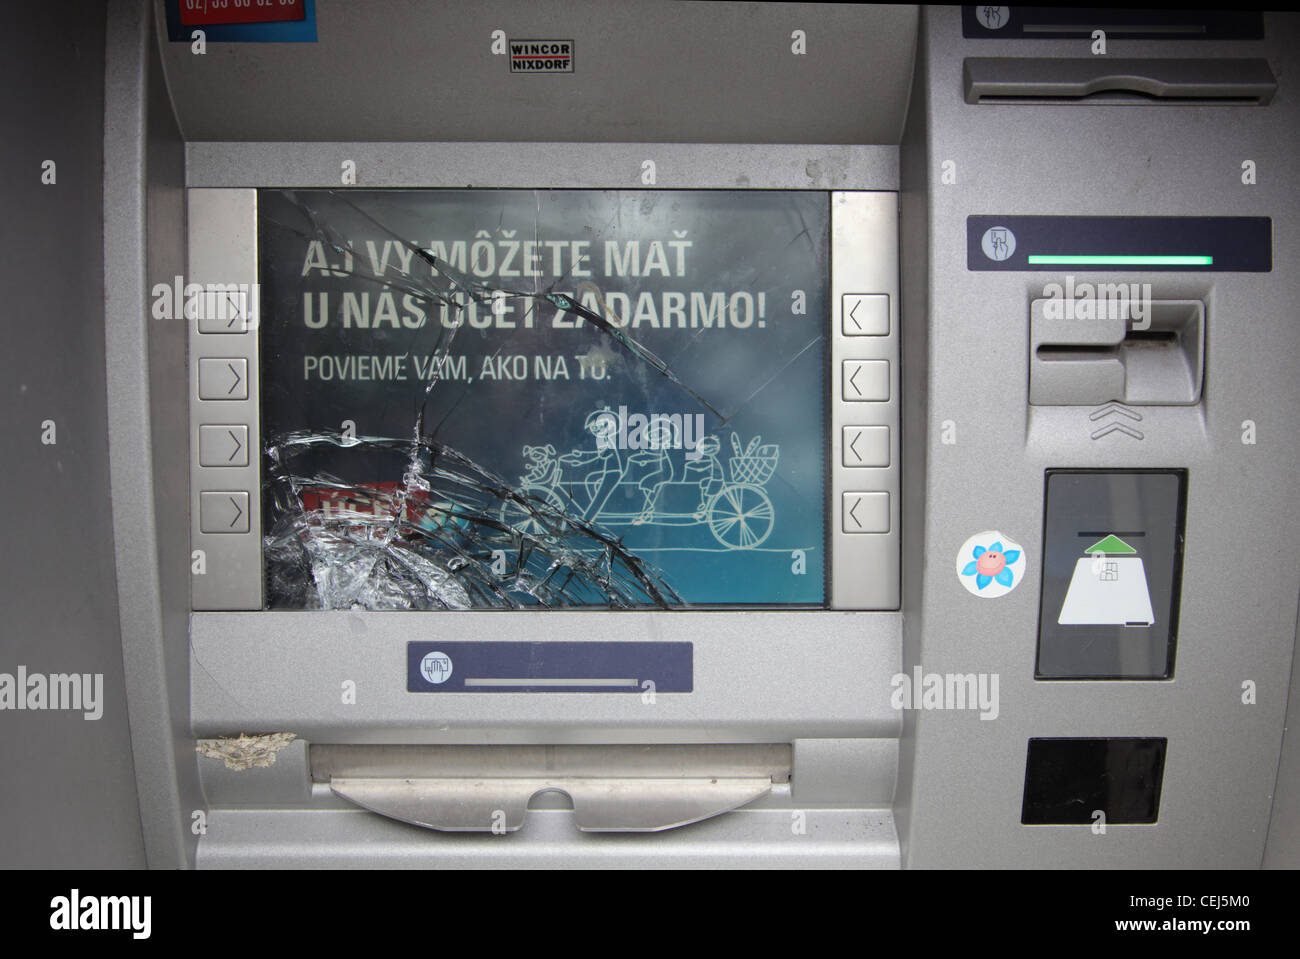 Cash Machine Dispenser Stock Photos & Cash Machine Dispenser